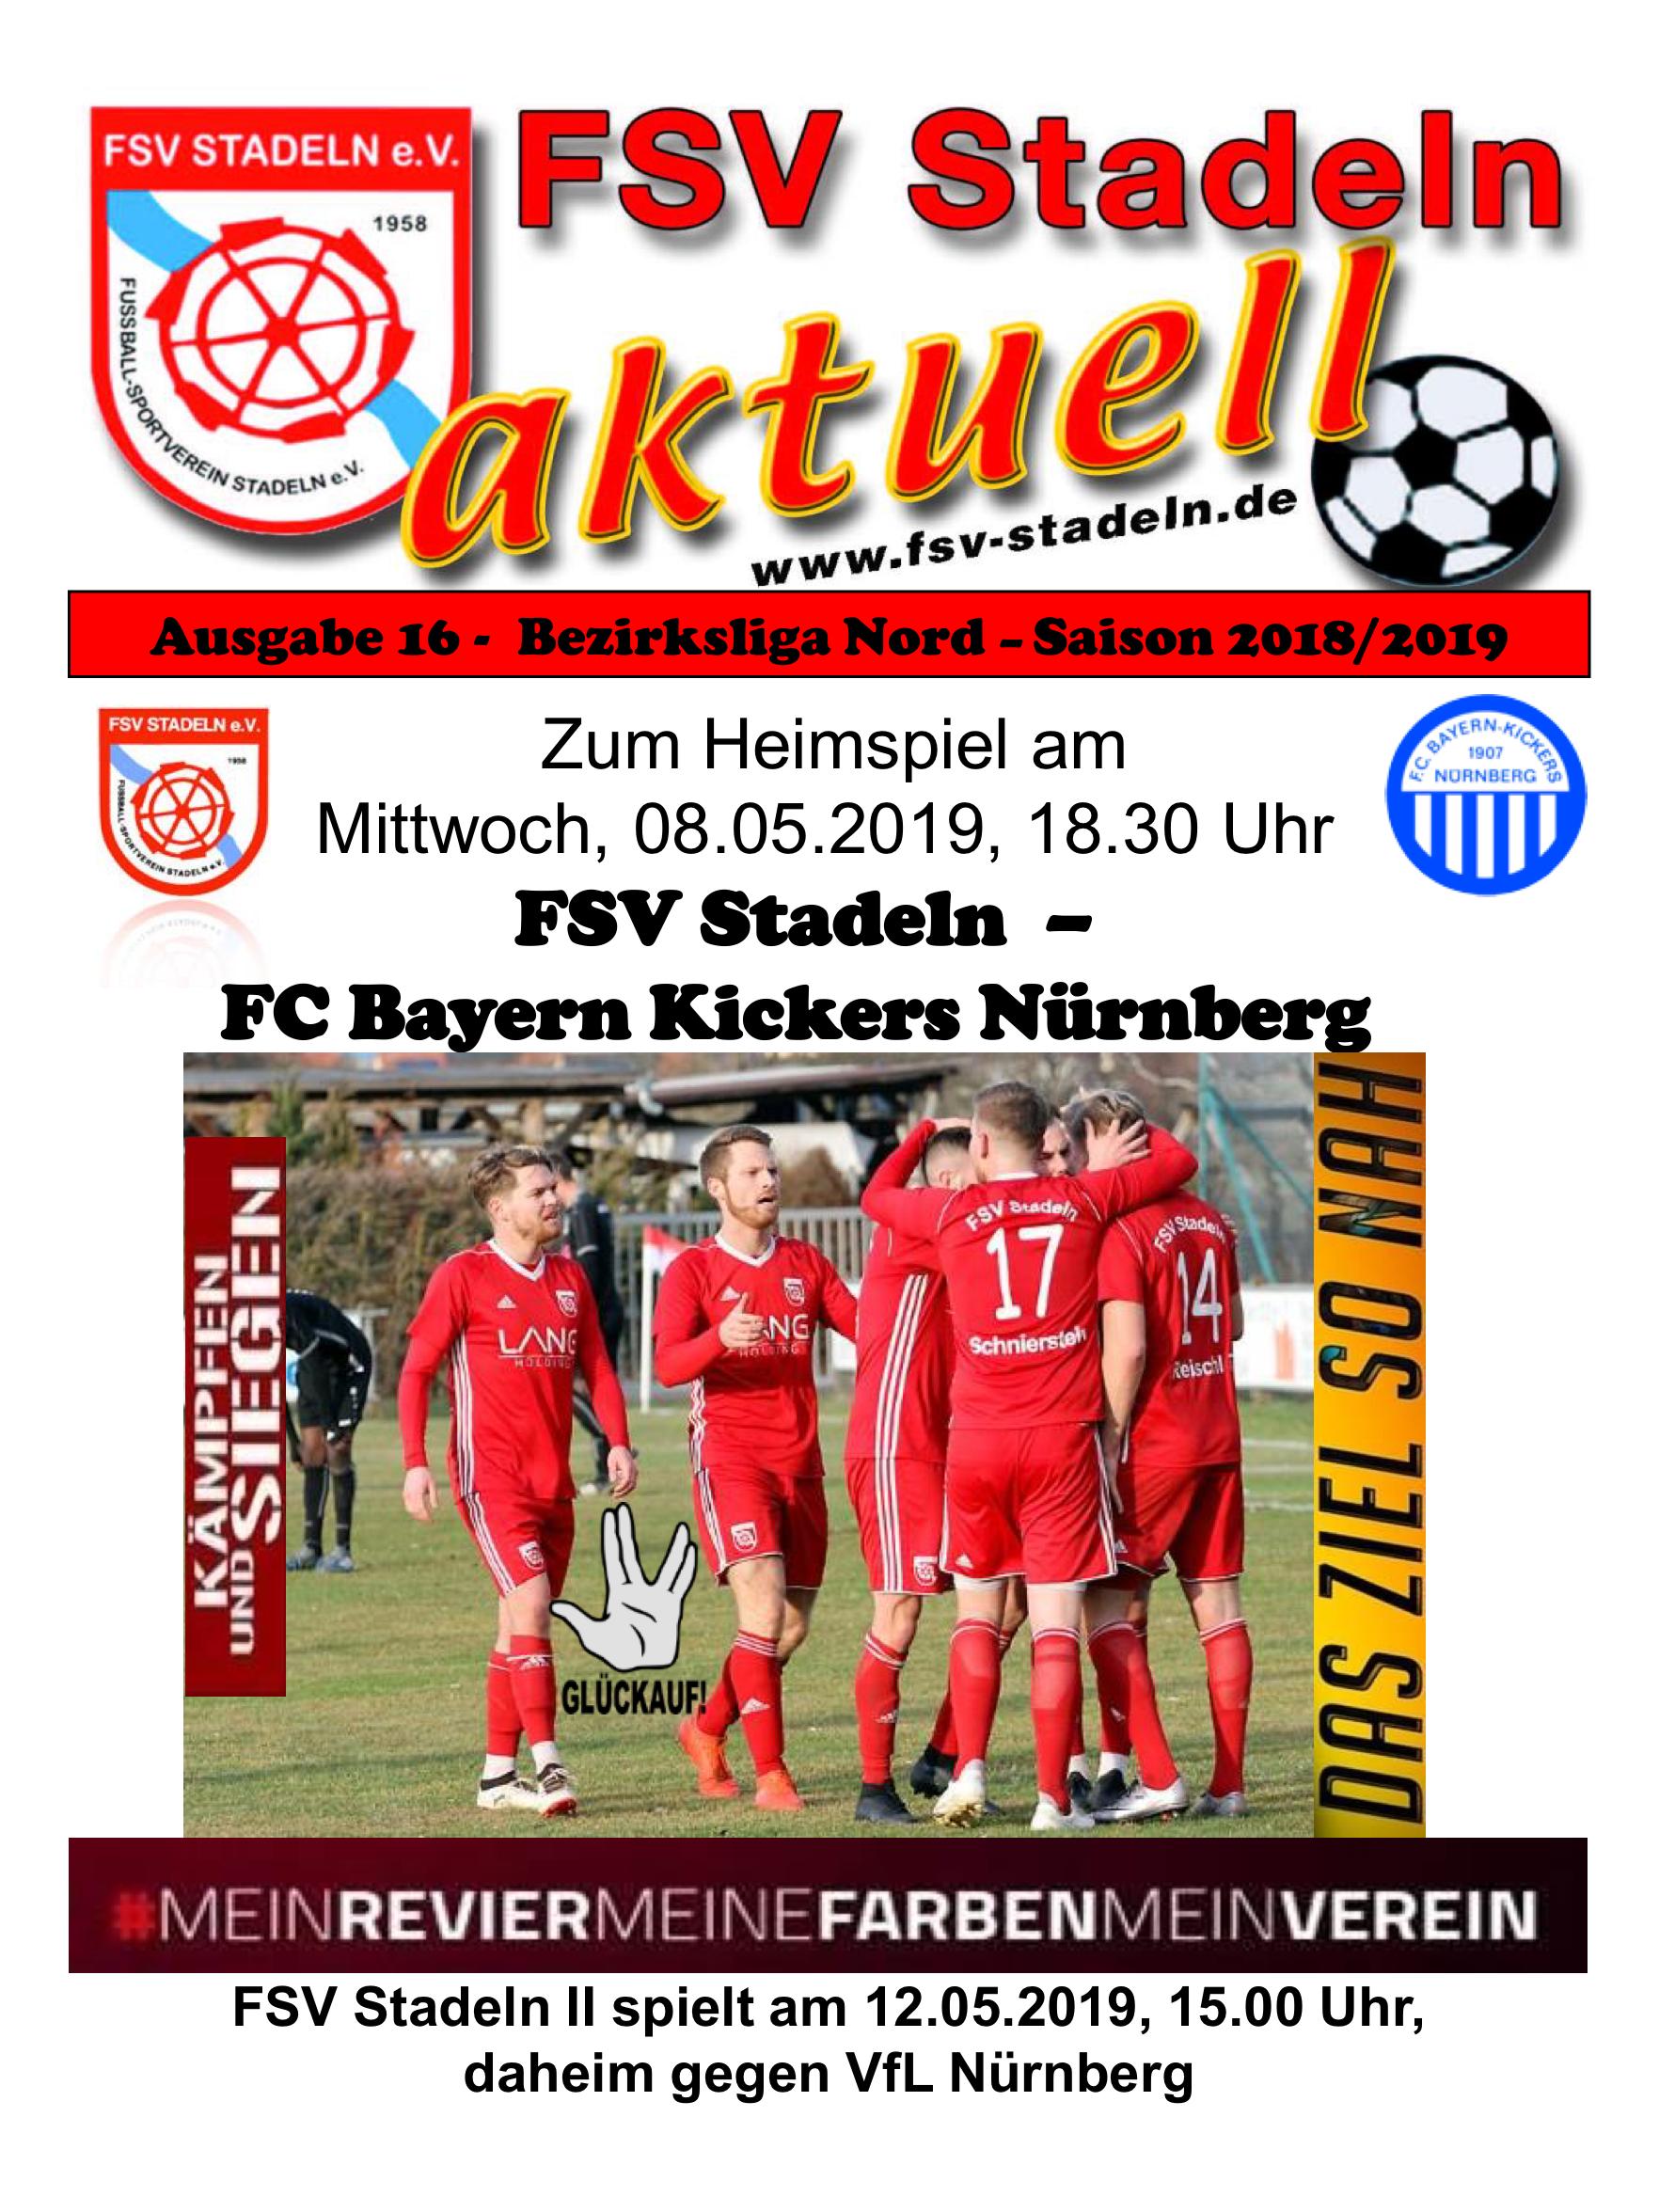 BayernKickers-1.png